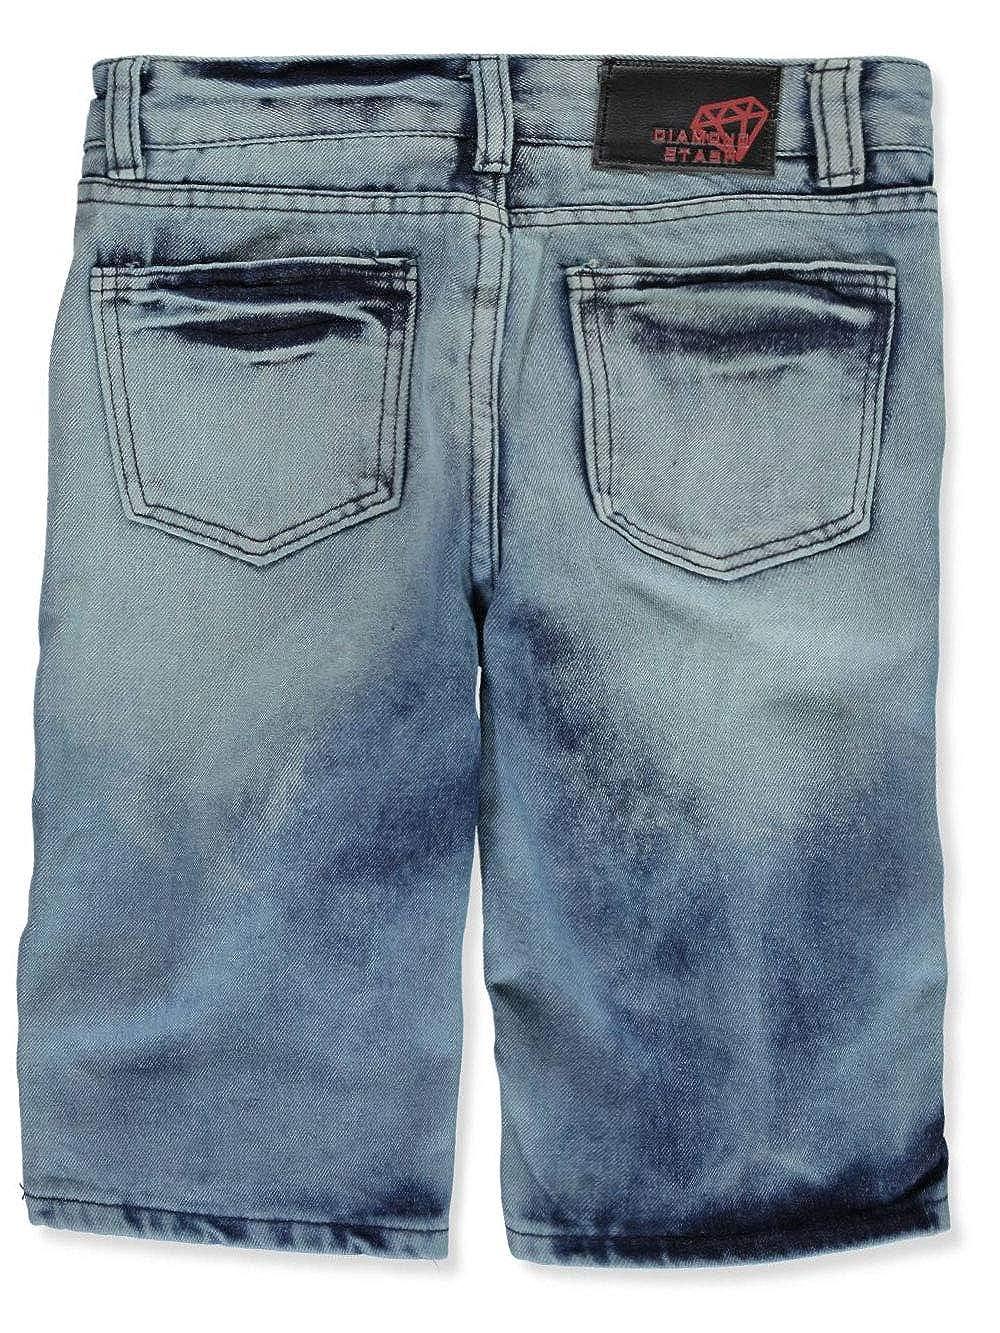 Diamond Stash Boys Shorts